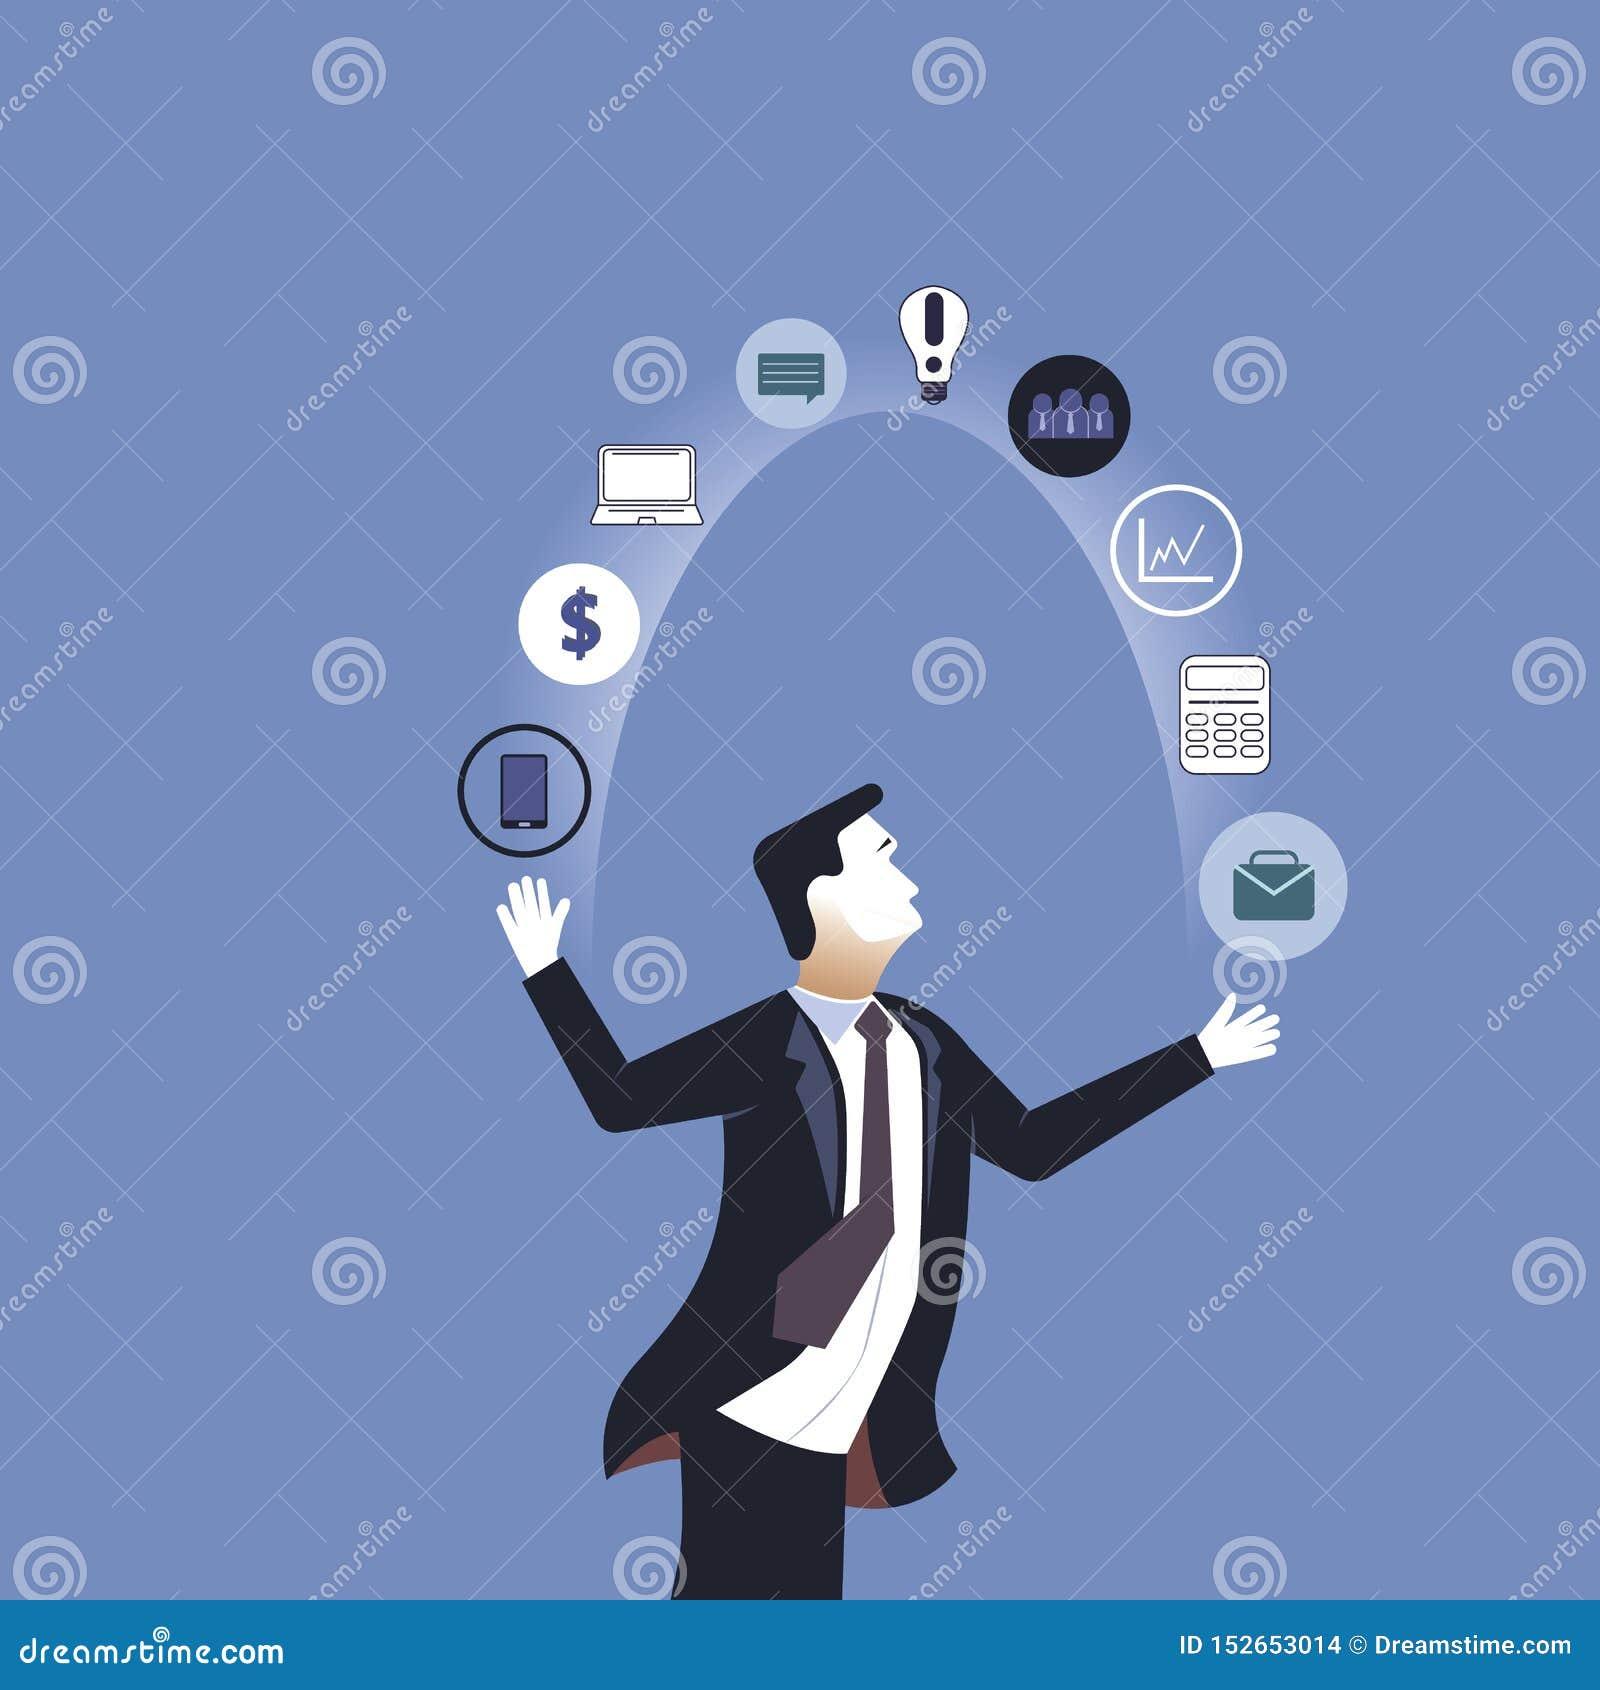 Acrobat. Businessman juggling business icons. Concept business vector illustration